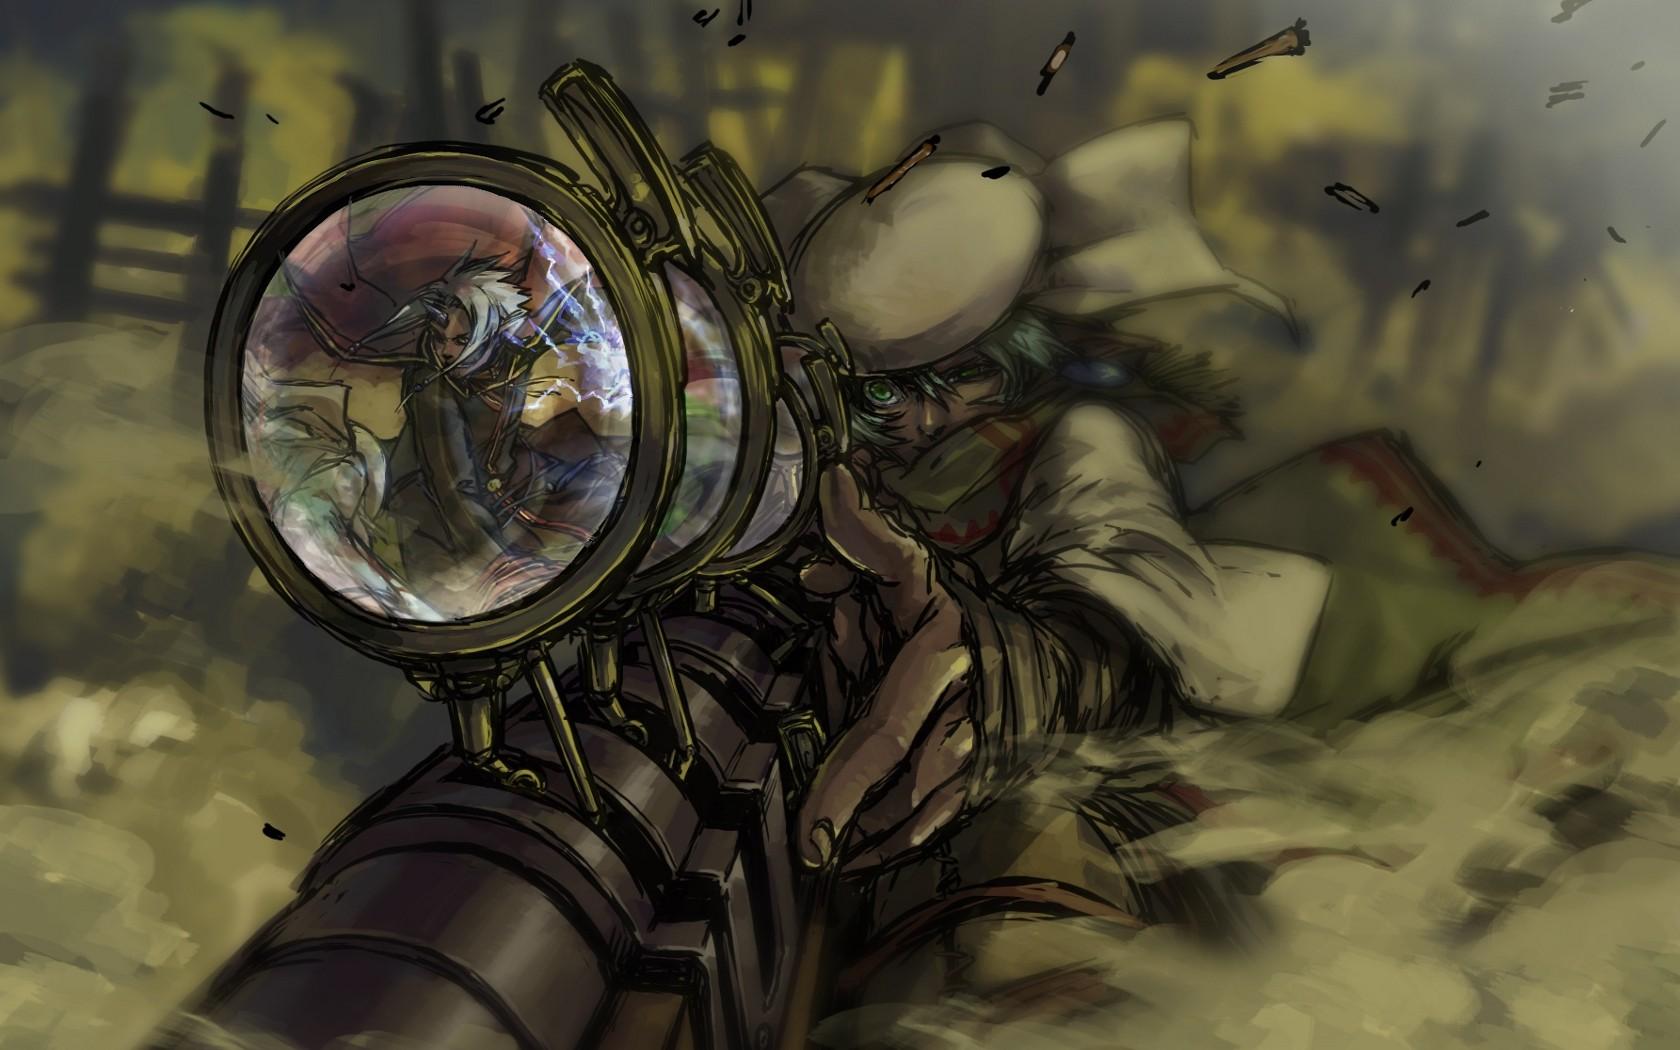 Drawn snipers wallpaper Soldier Pinterest Wallpaper Steampunk Steampunk